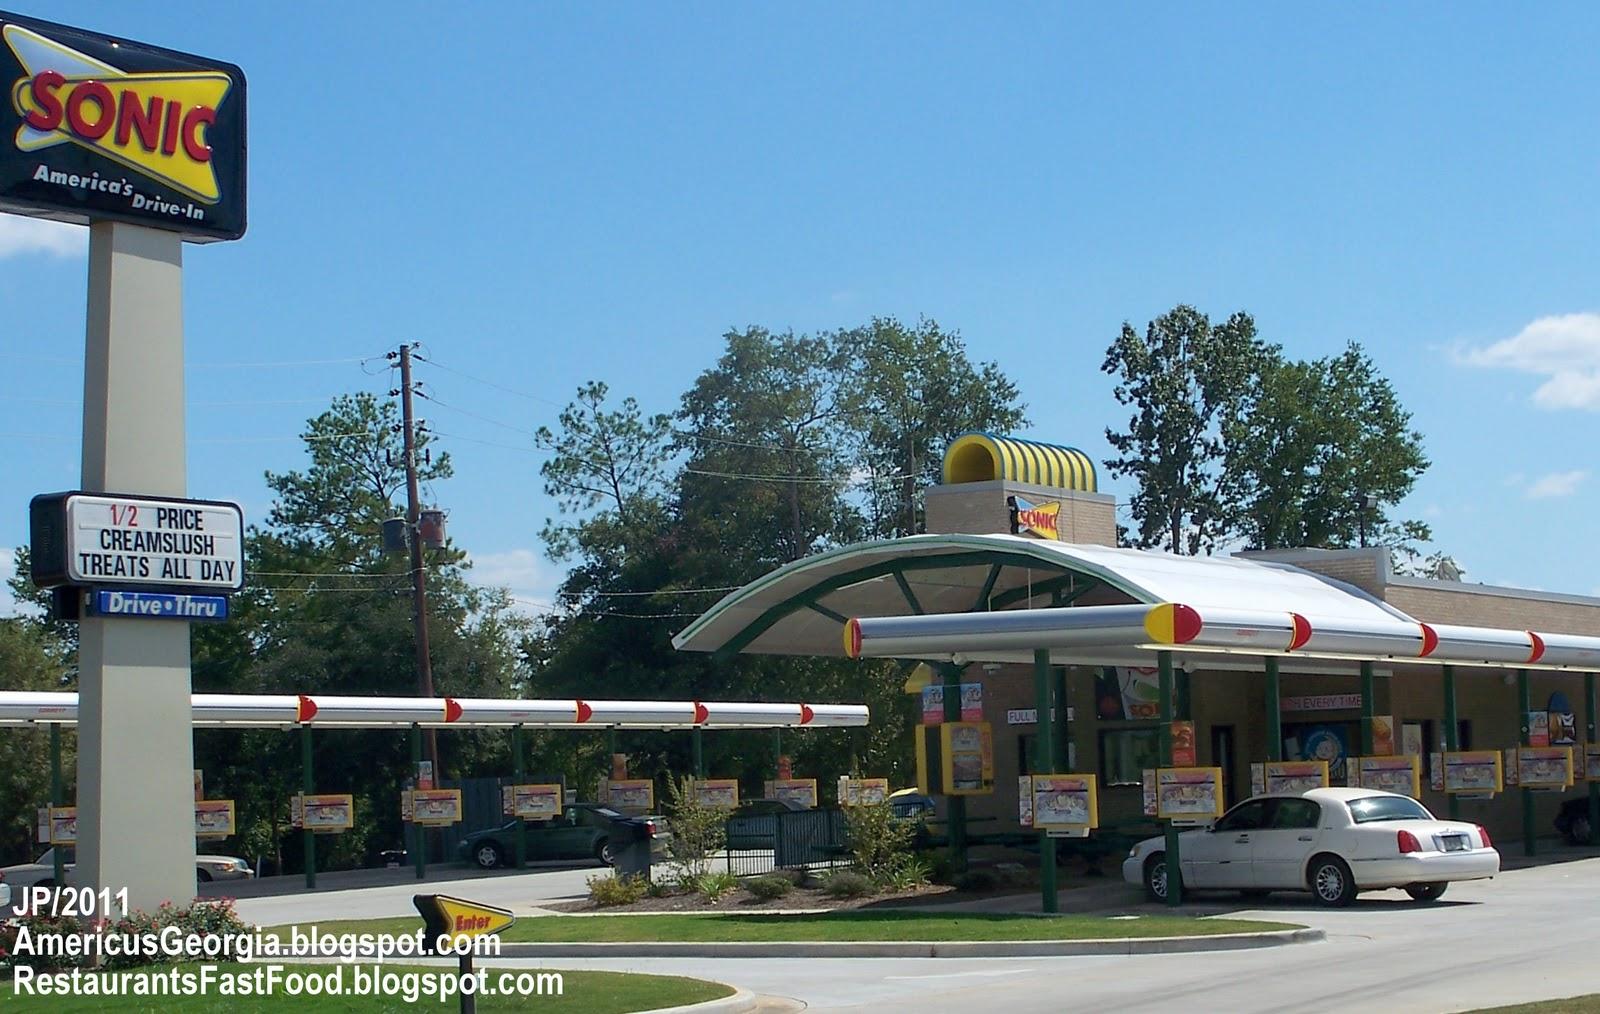 Sonic Drive In Restaurant Americus Georgia East Lamar Street Hamburger Fast Food Ga